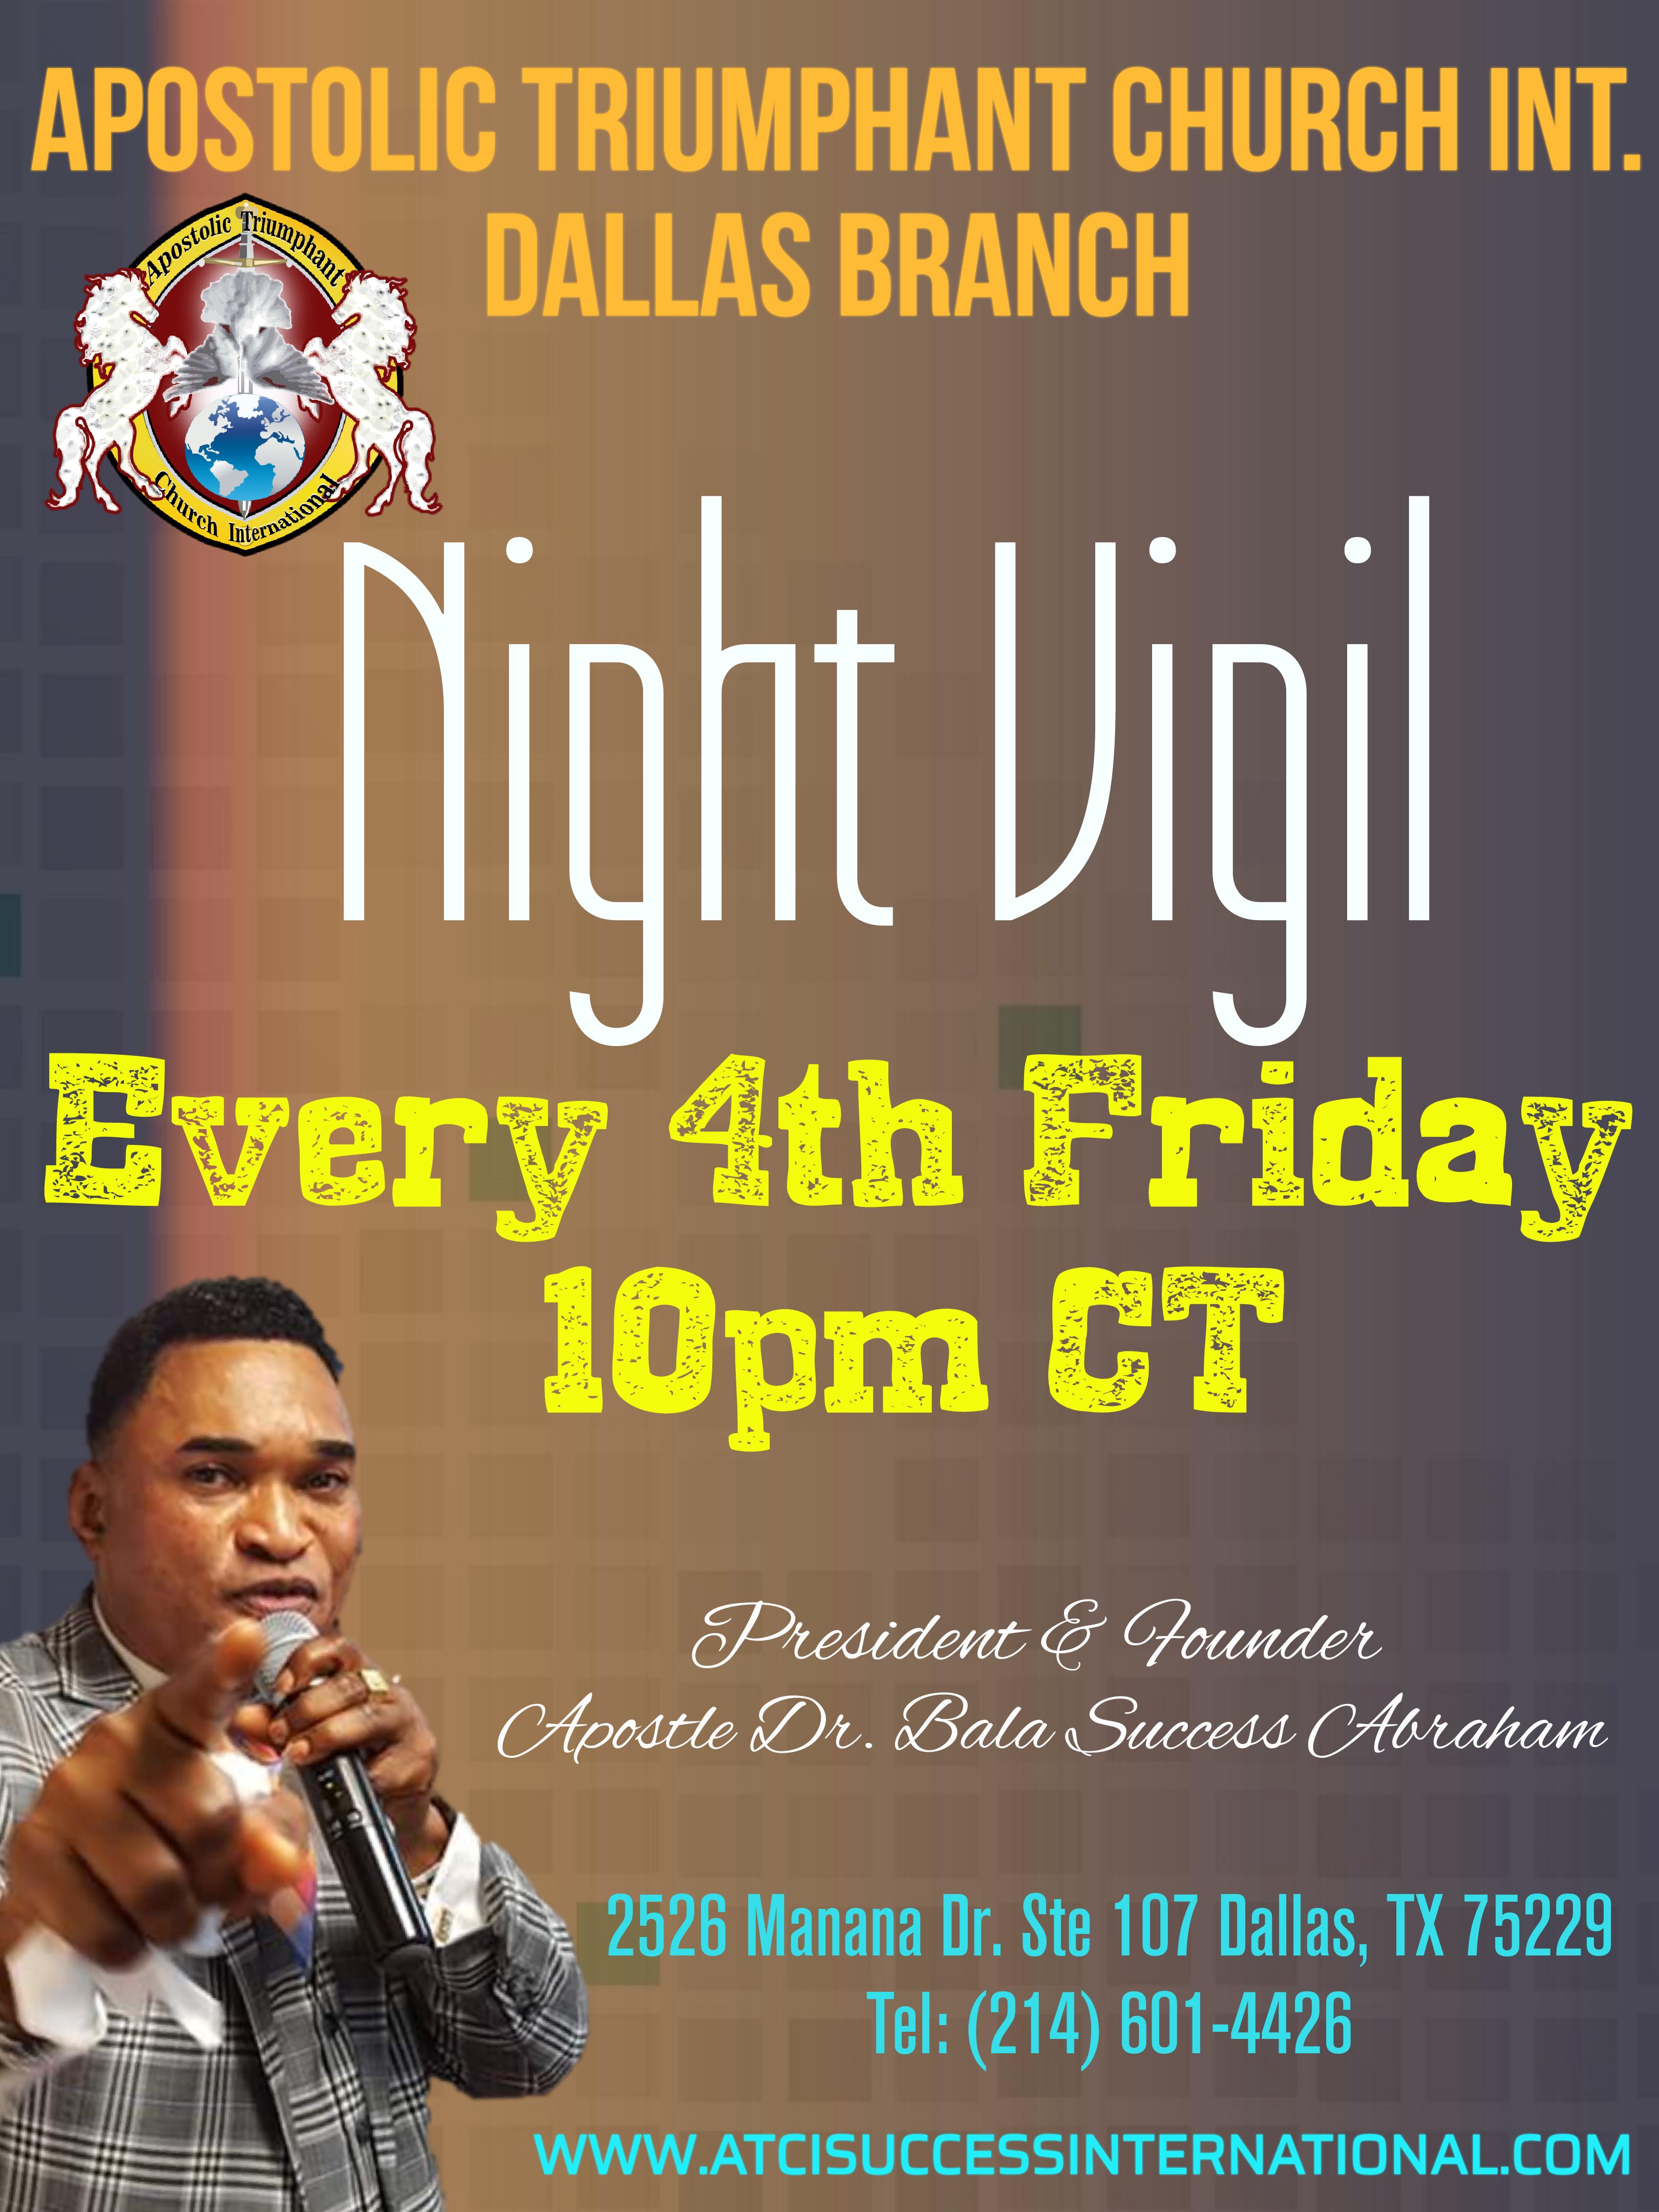 Dallas Night Vigil